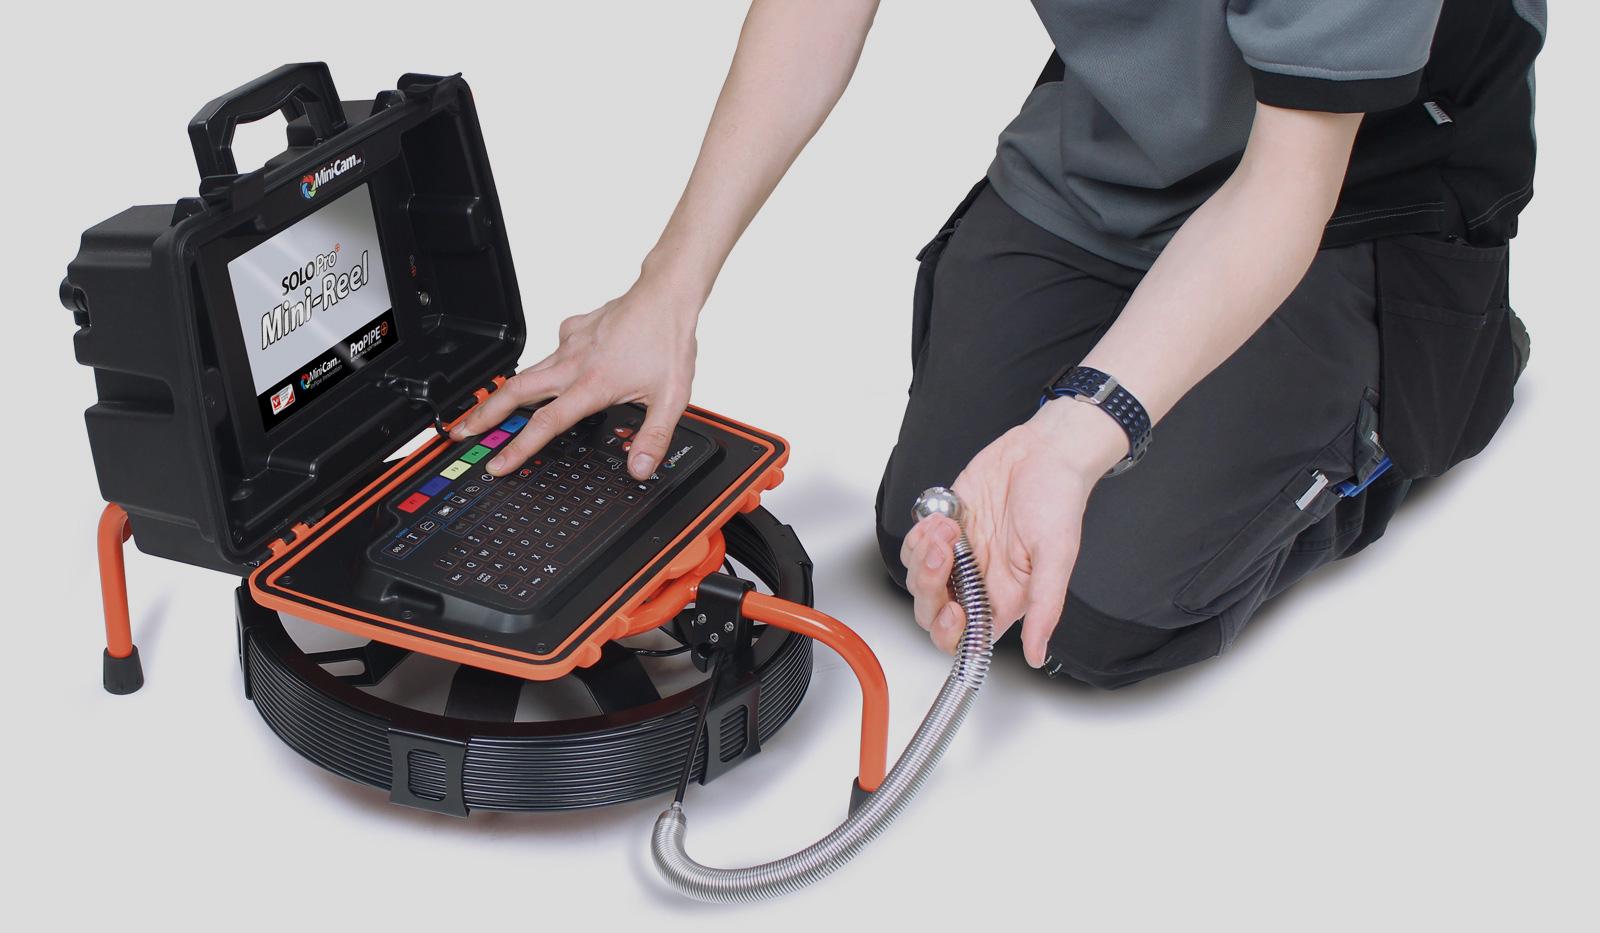 Completa o teu sistema SOLOPro+® com o novo tambor Mini-Reel